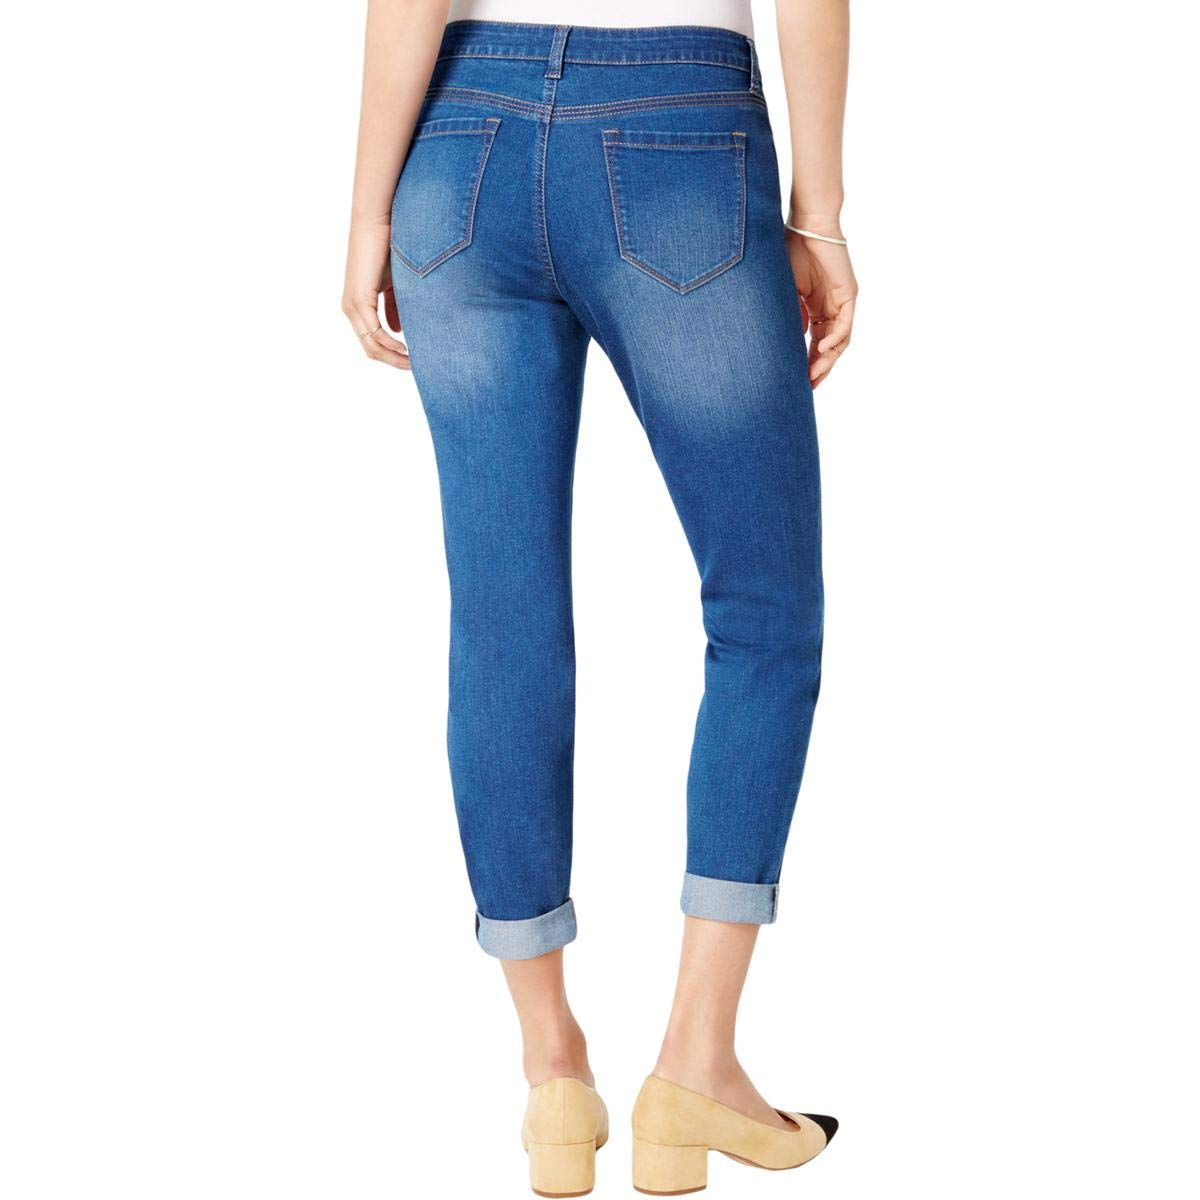 Maison Jules Womens Mid-Rise Medium Wash Boyfriend Jeans